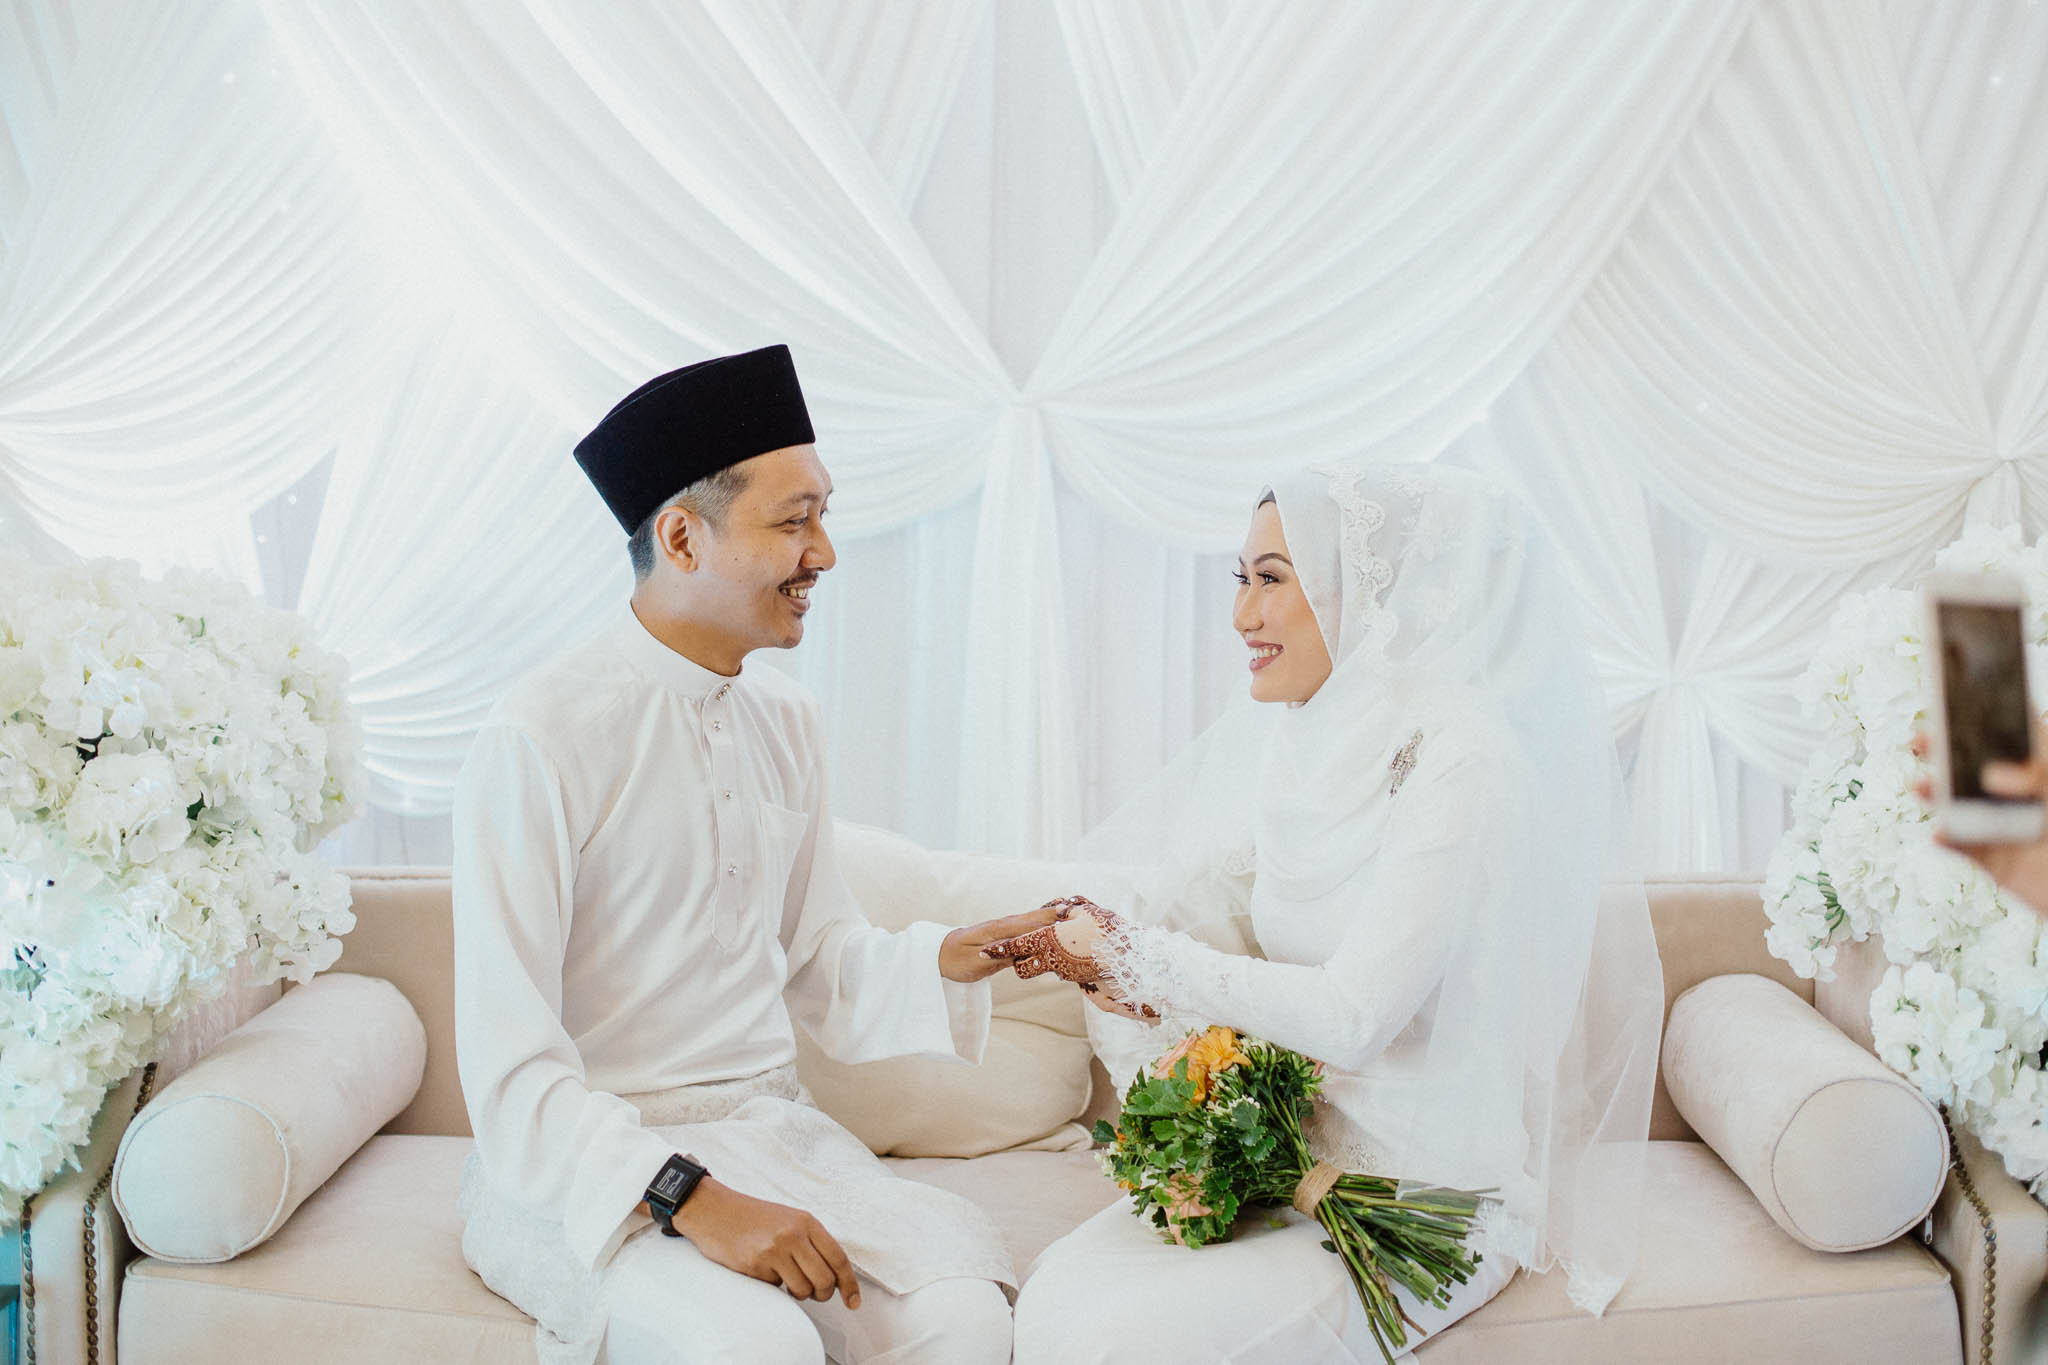 singapore-wedding-photographer-addafiq-nufail-027.jpg